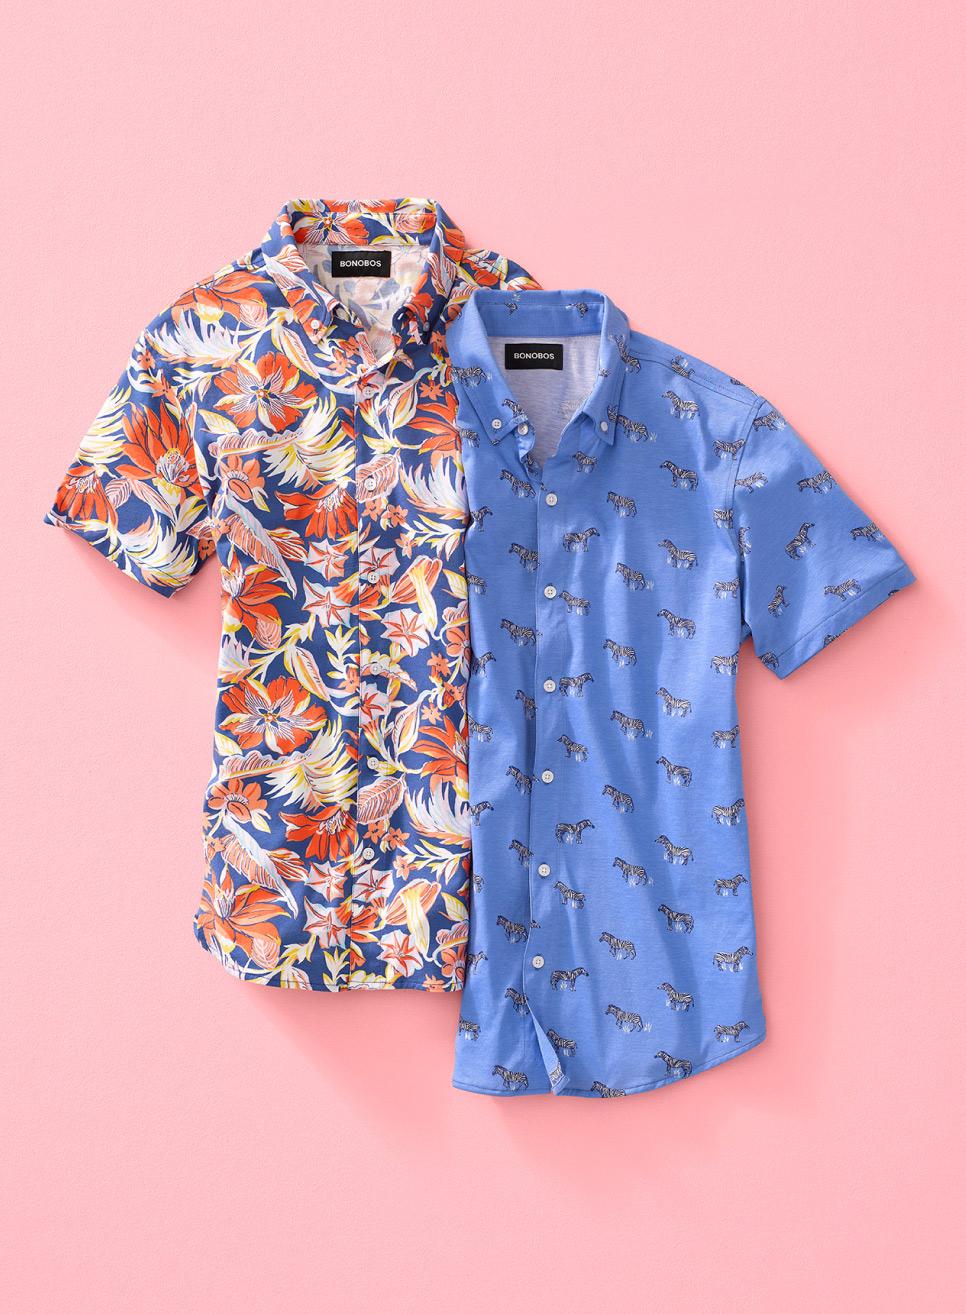 image of two Jersey Riviera Shirts